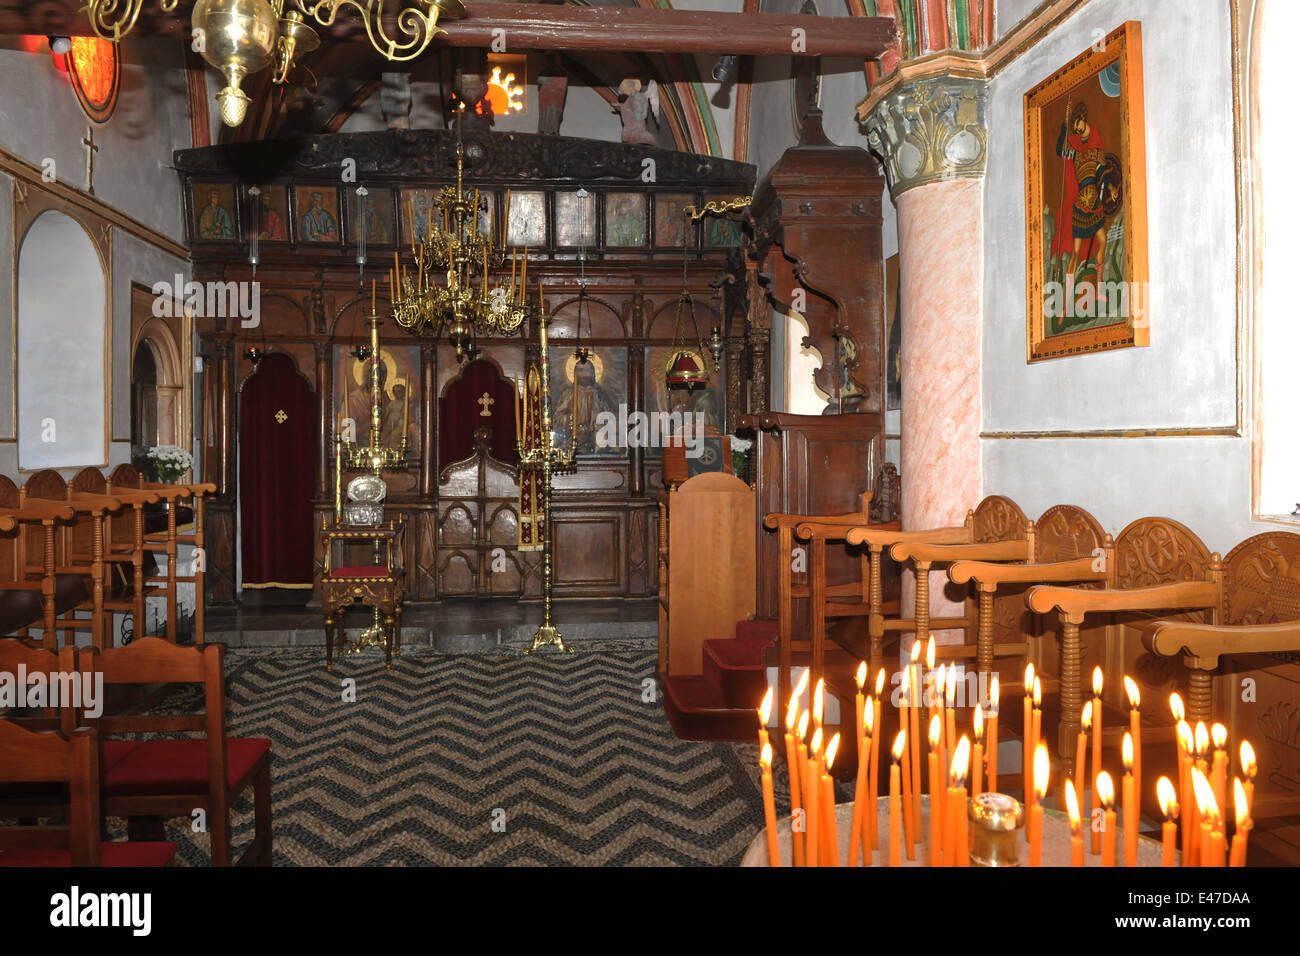 Griechenland, Rhodos, Lardos, Kloster Moni Ipseni - Stock Image